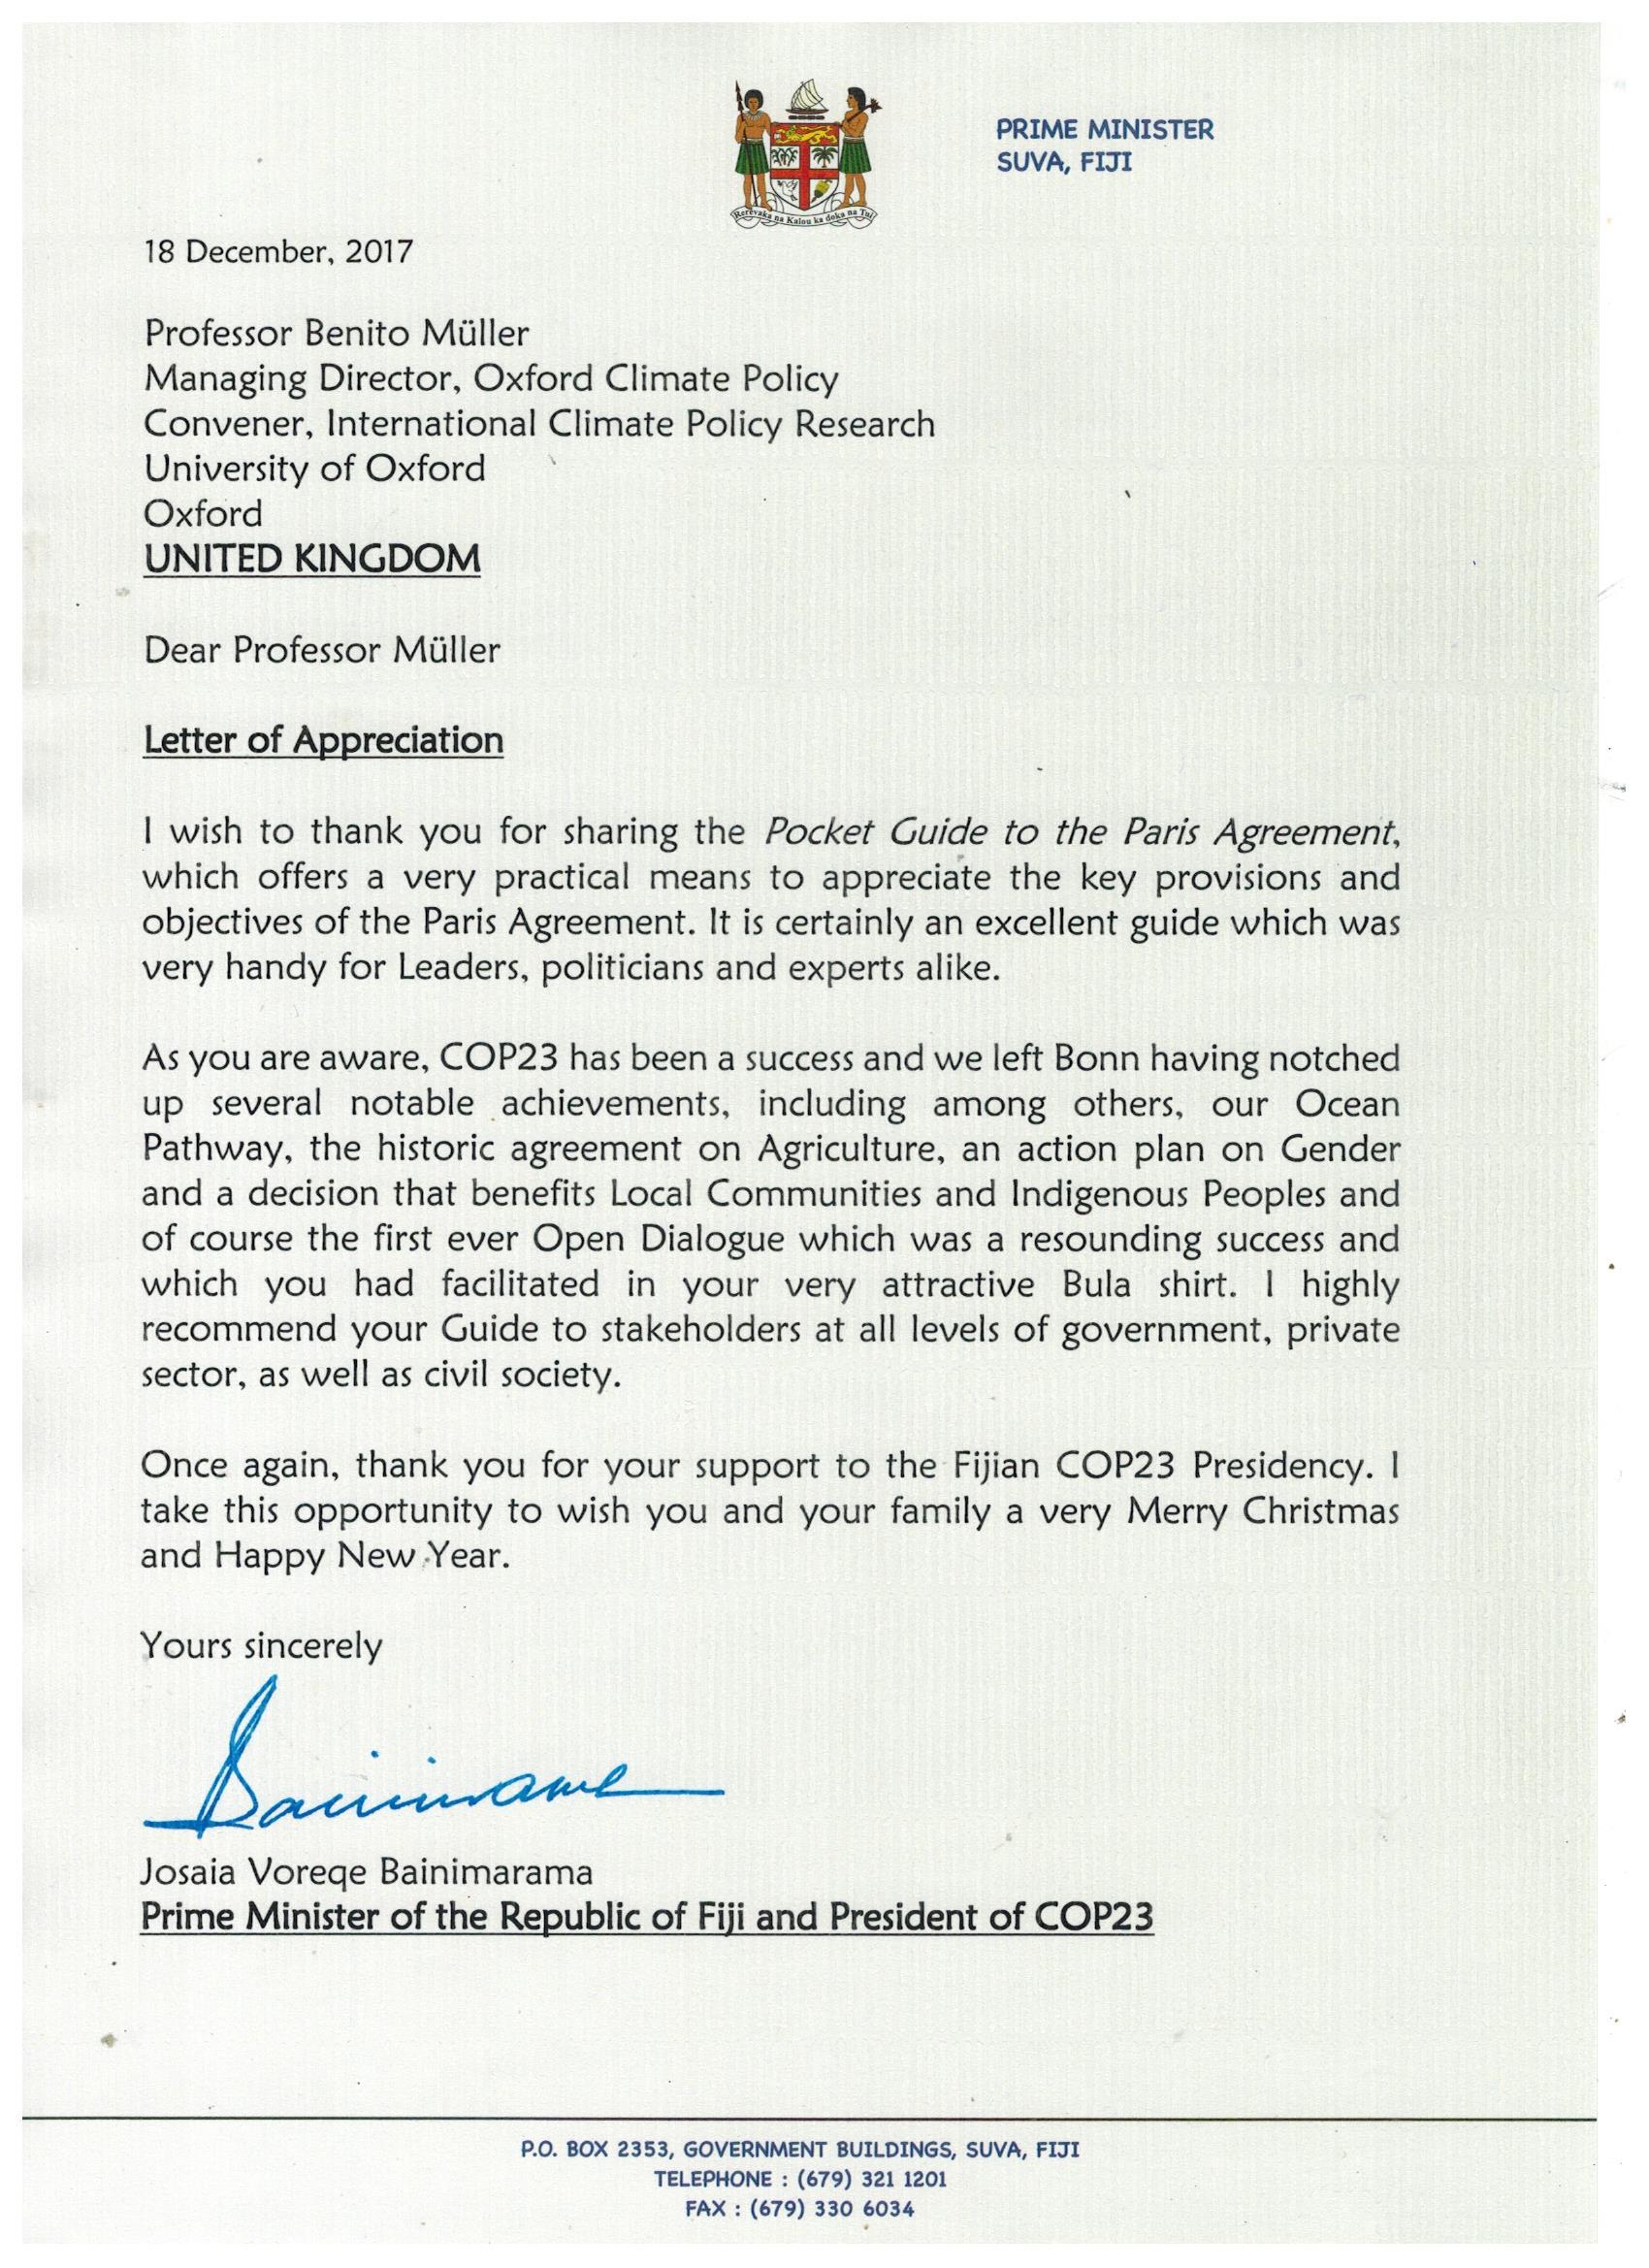 a letter of appreciation from fijian prime minister josaia voreqe bainimarama who presided over unfccc cop23